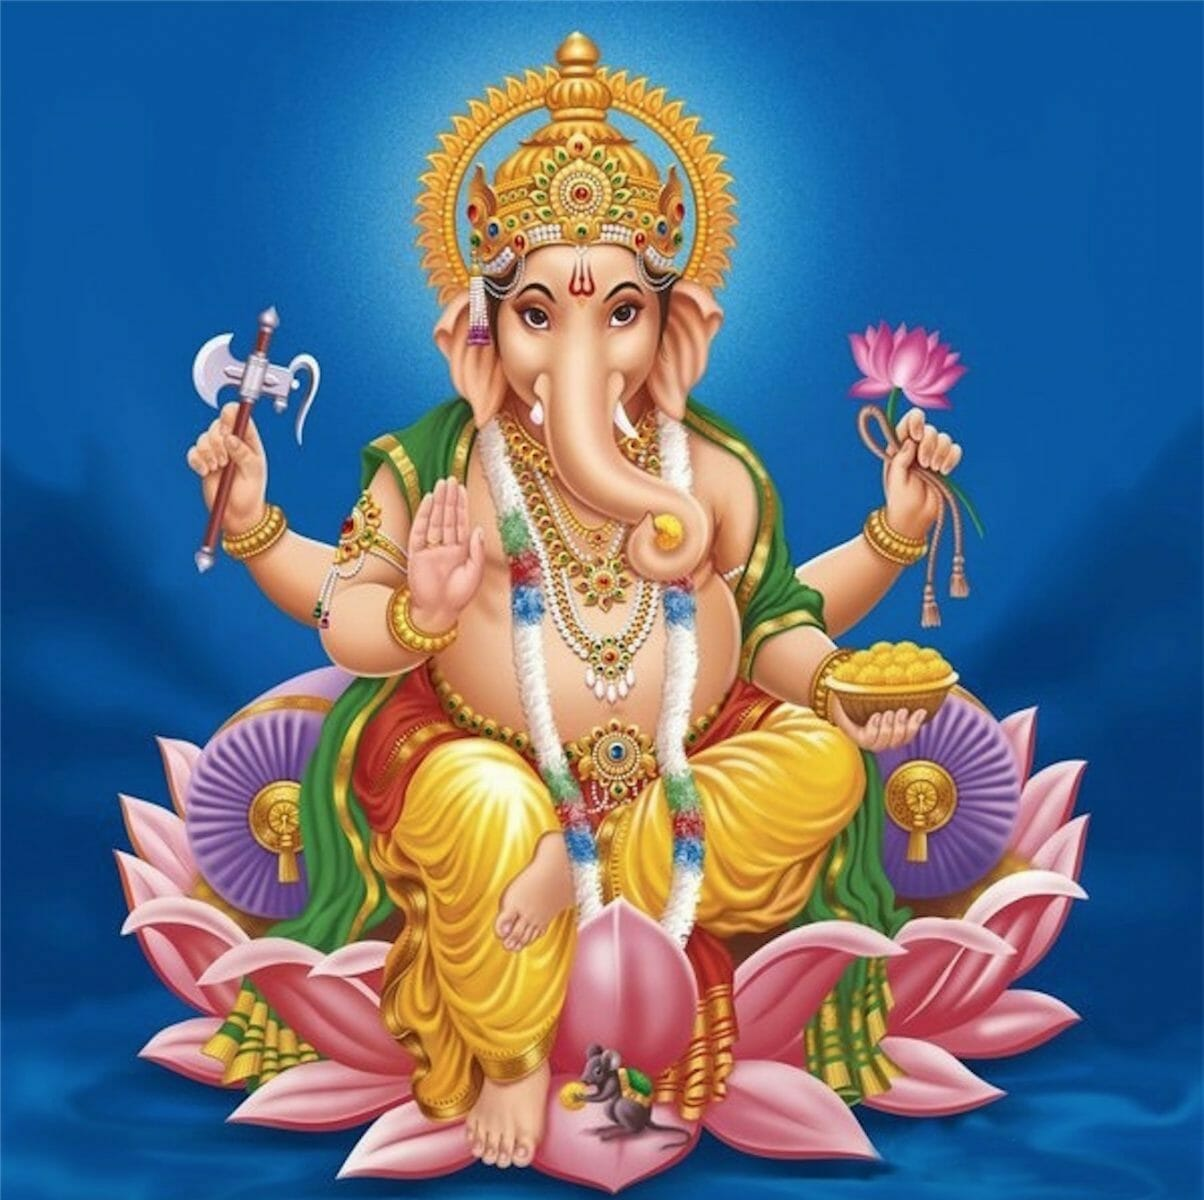 Spiritual Festival: Ganesha Chaturthi